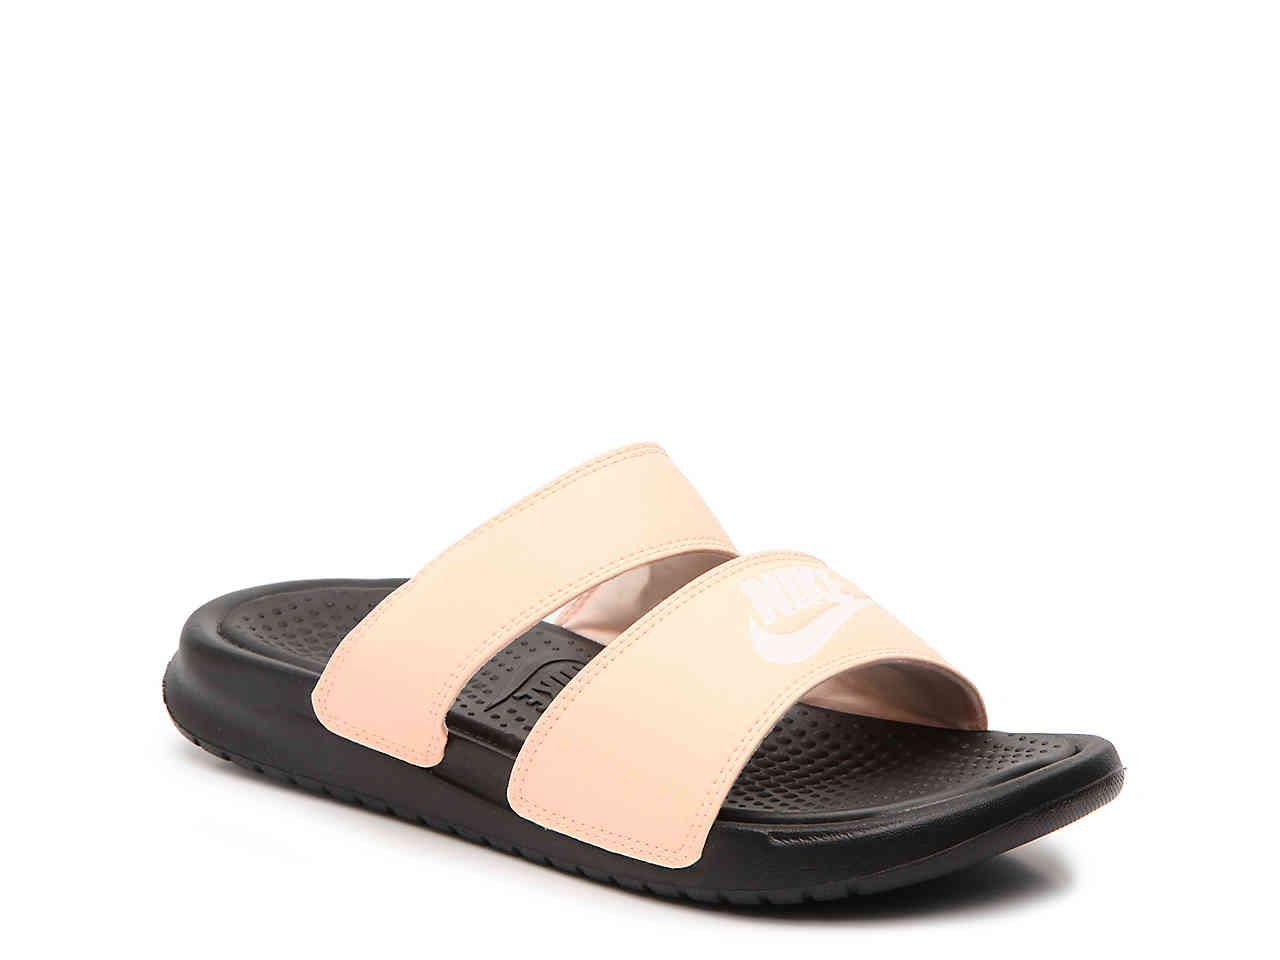 Nike Sportswear BENASSI DUO ULTRA SLIDE - Mules - black/guava ice rFcAjU